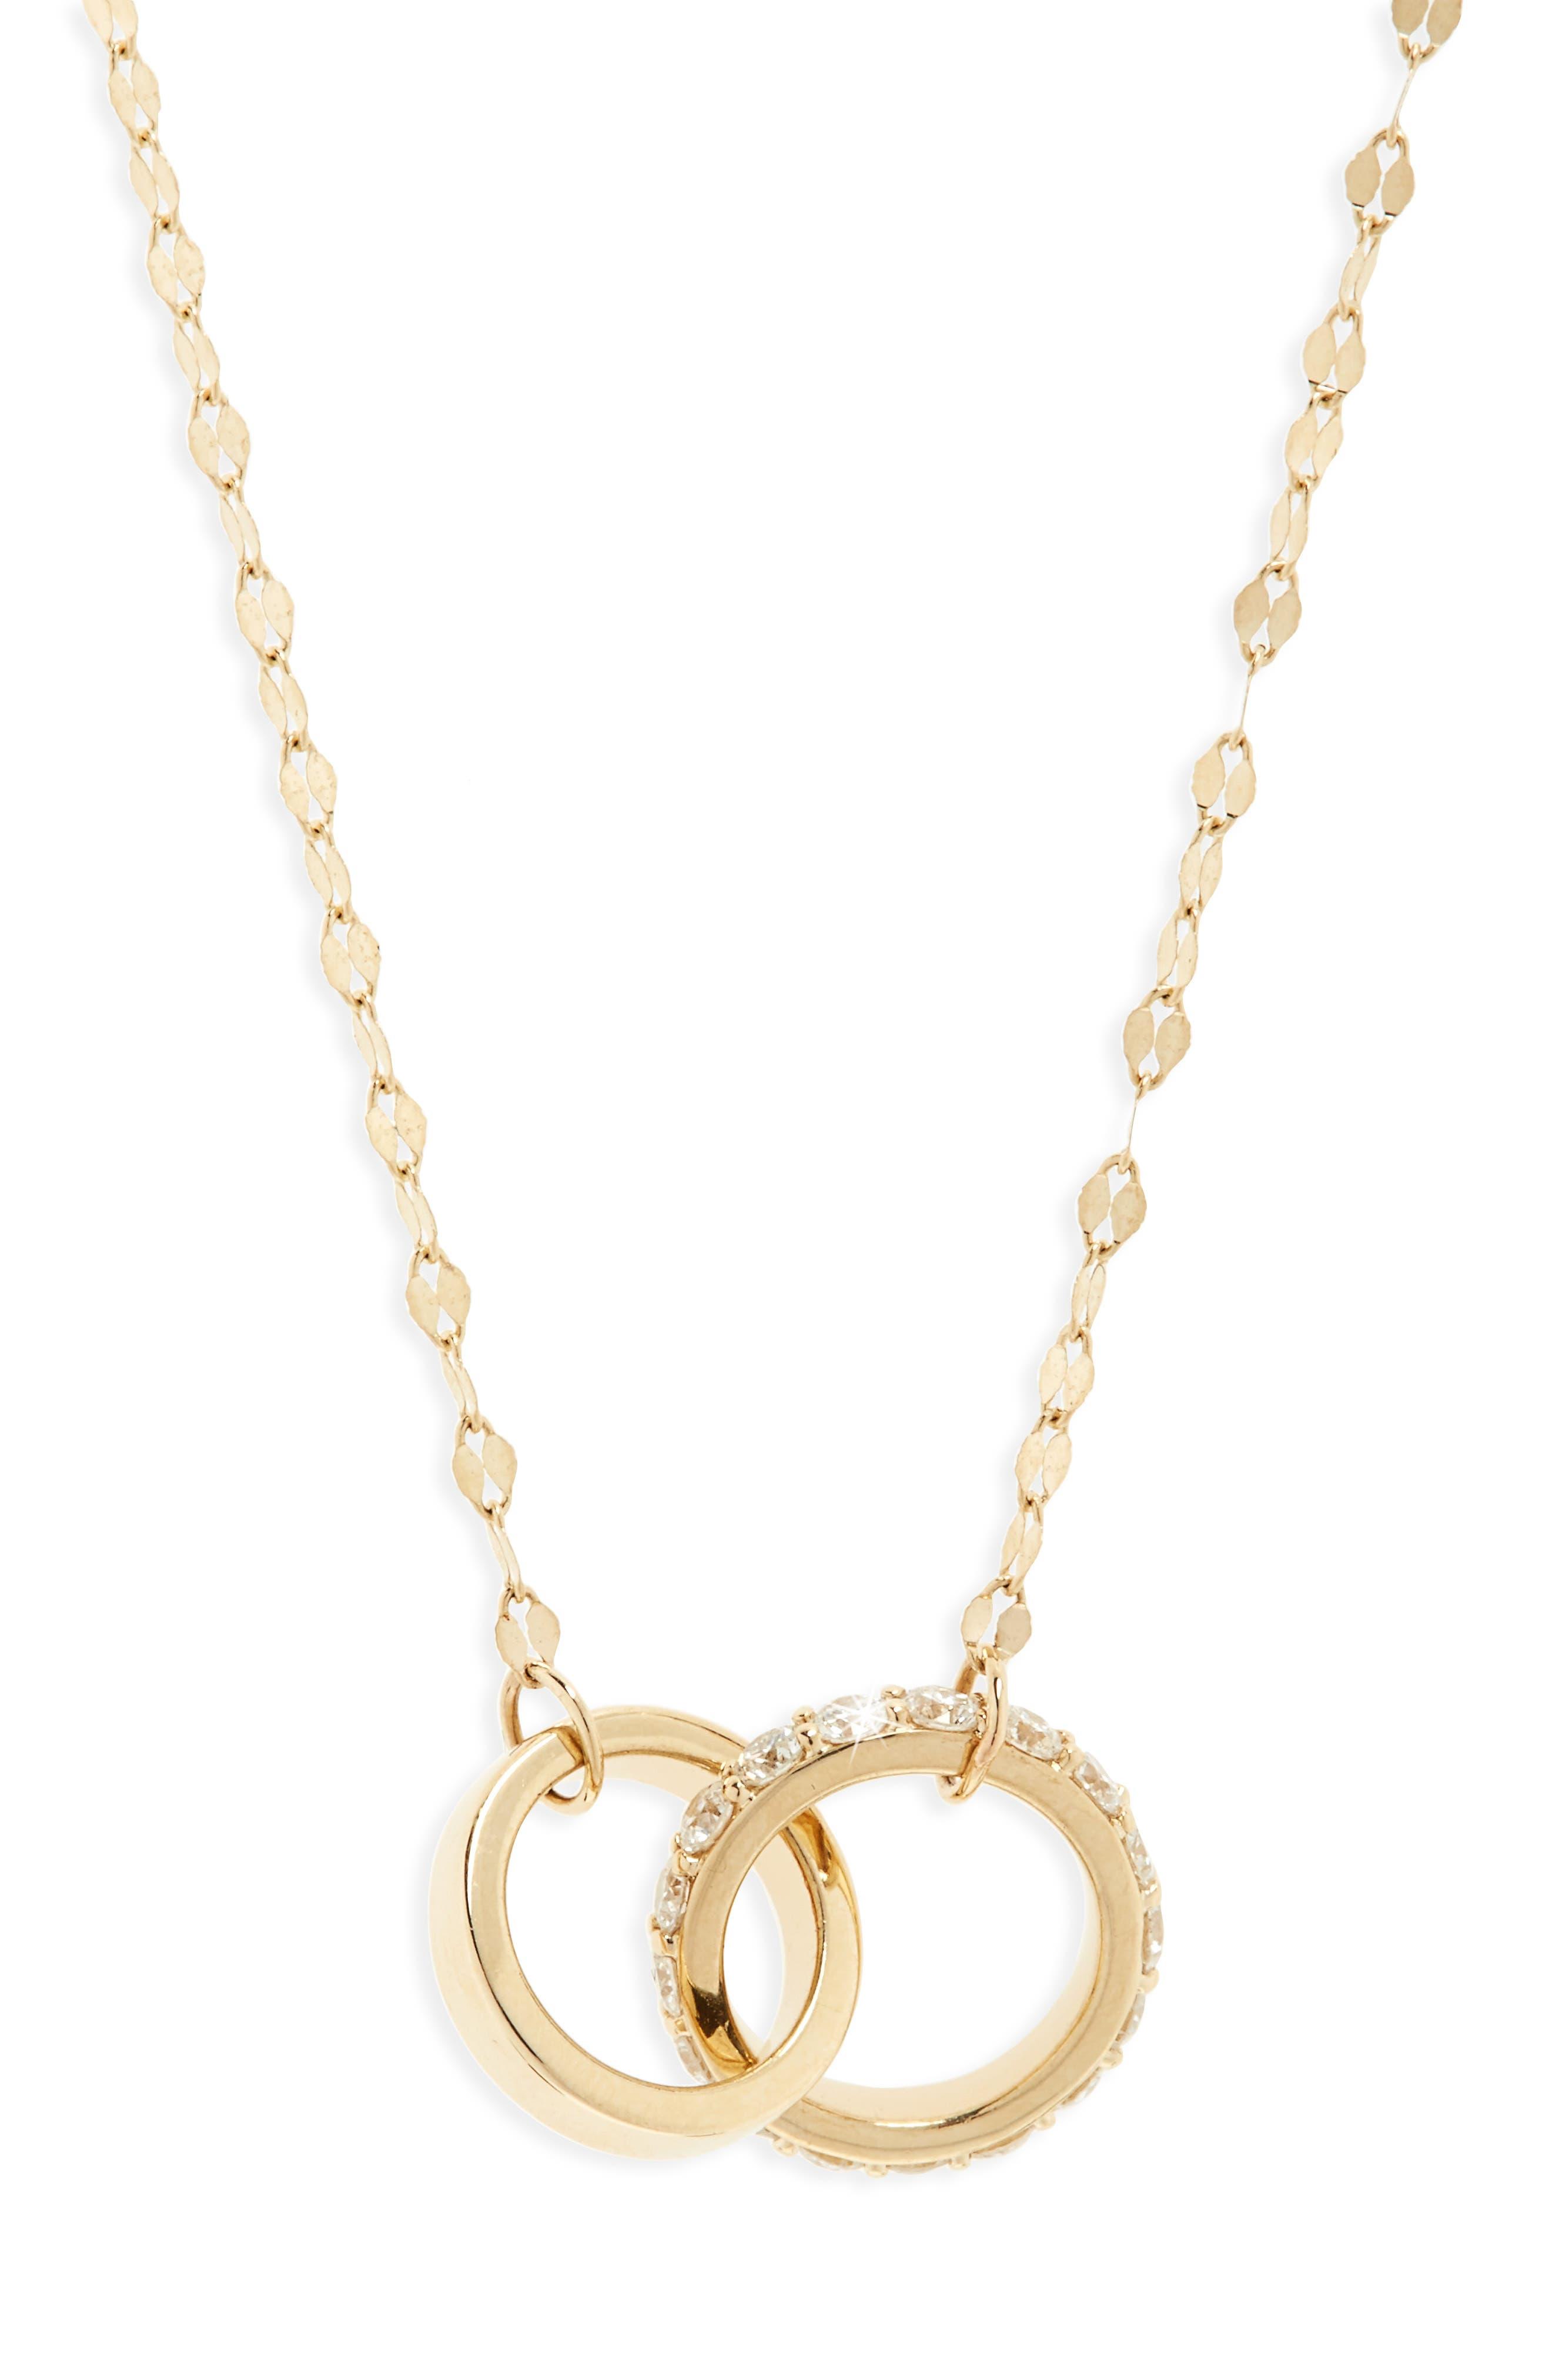 Main Image - Lana Jewelry Flawless Diamond Link Pendant Necklace